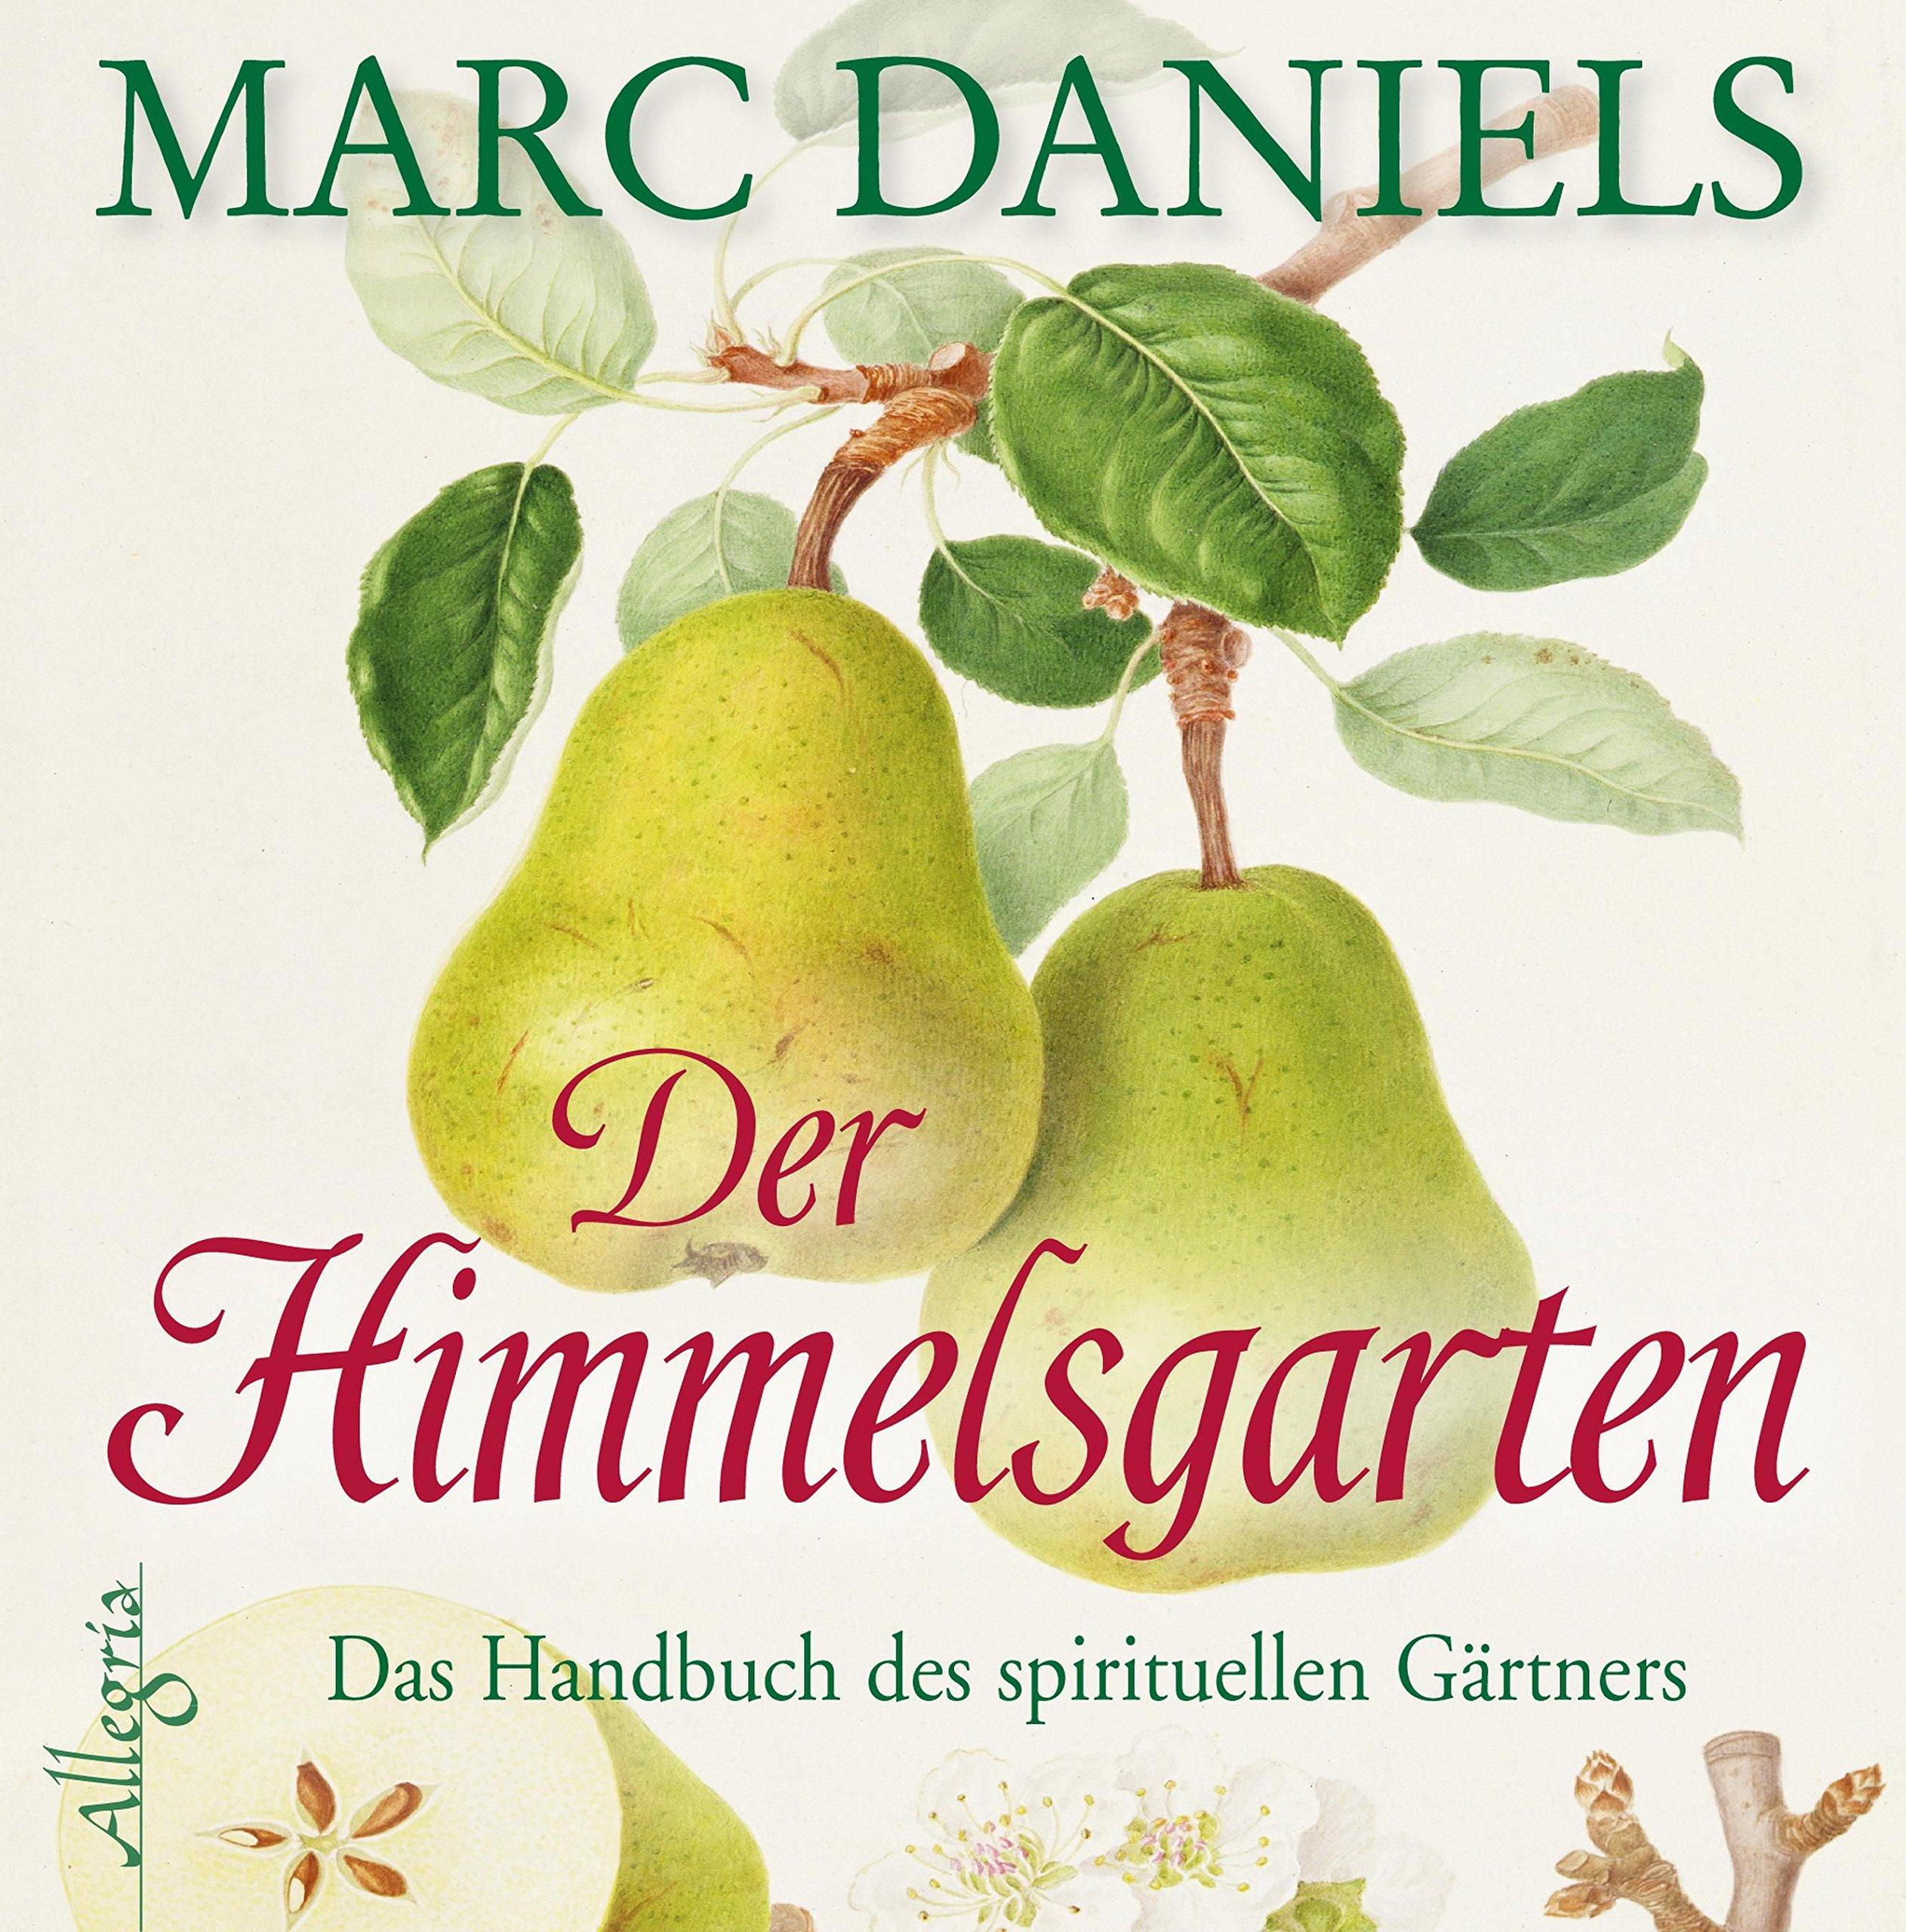 Der Himmelsgarten: Das Handbuch des spirituellen Gärtners